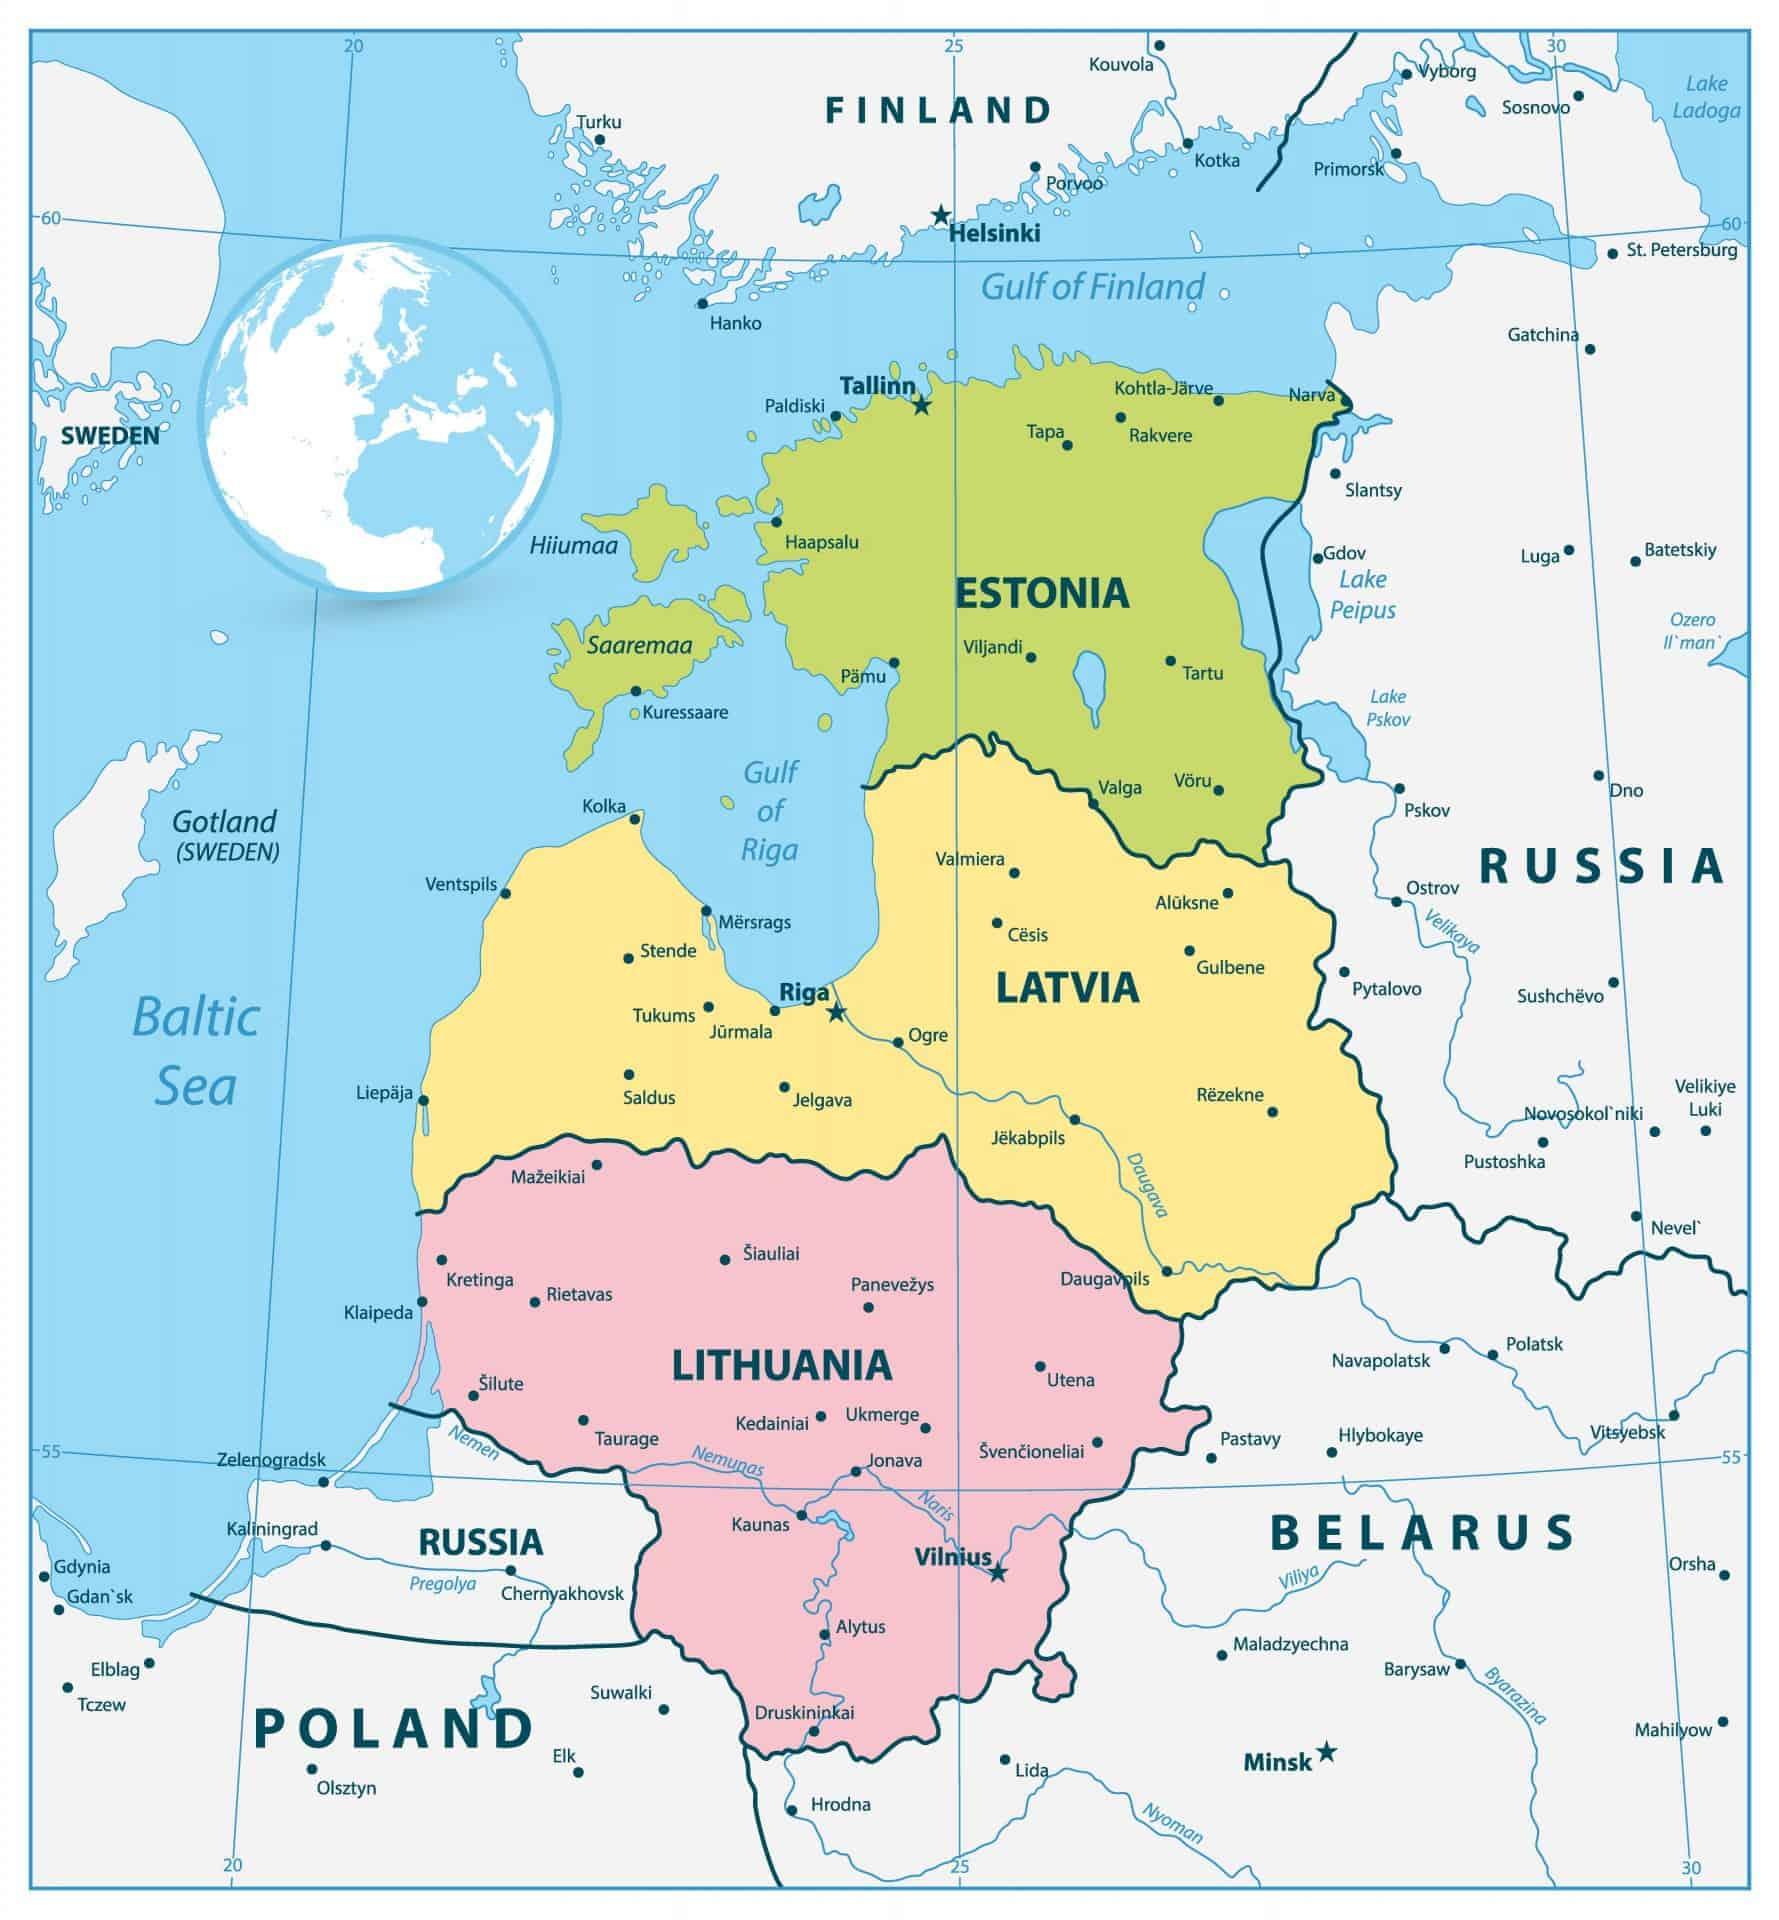 Map of the Baltics